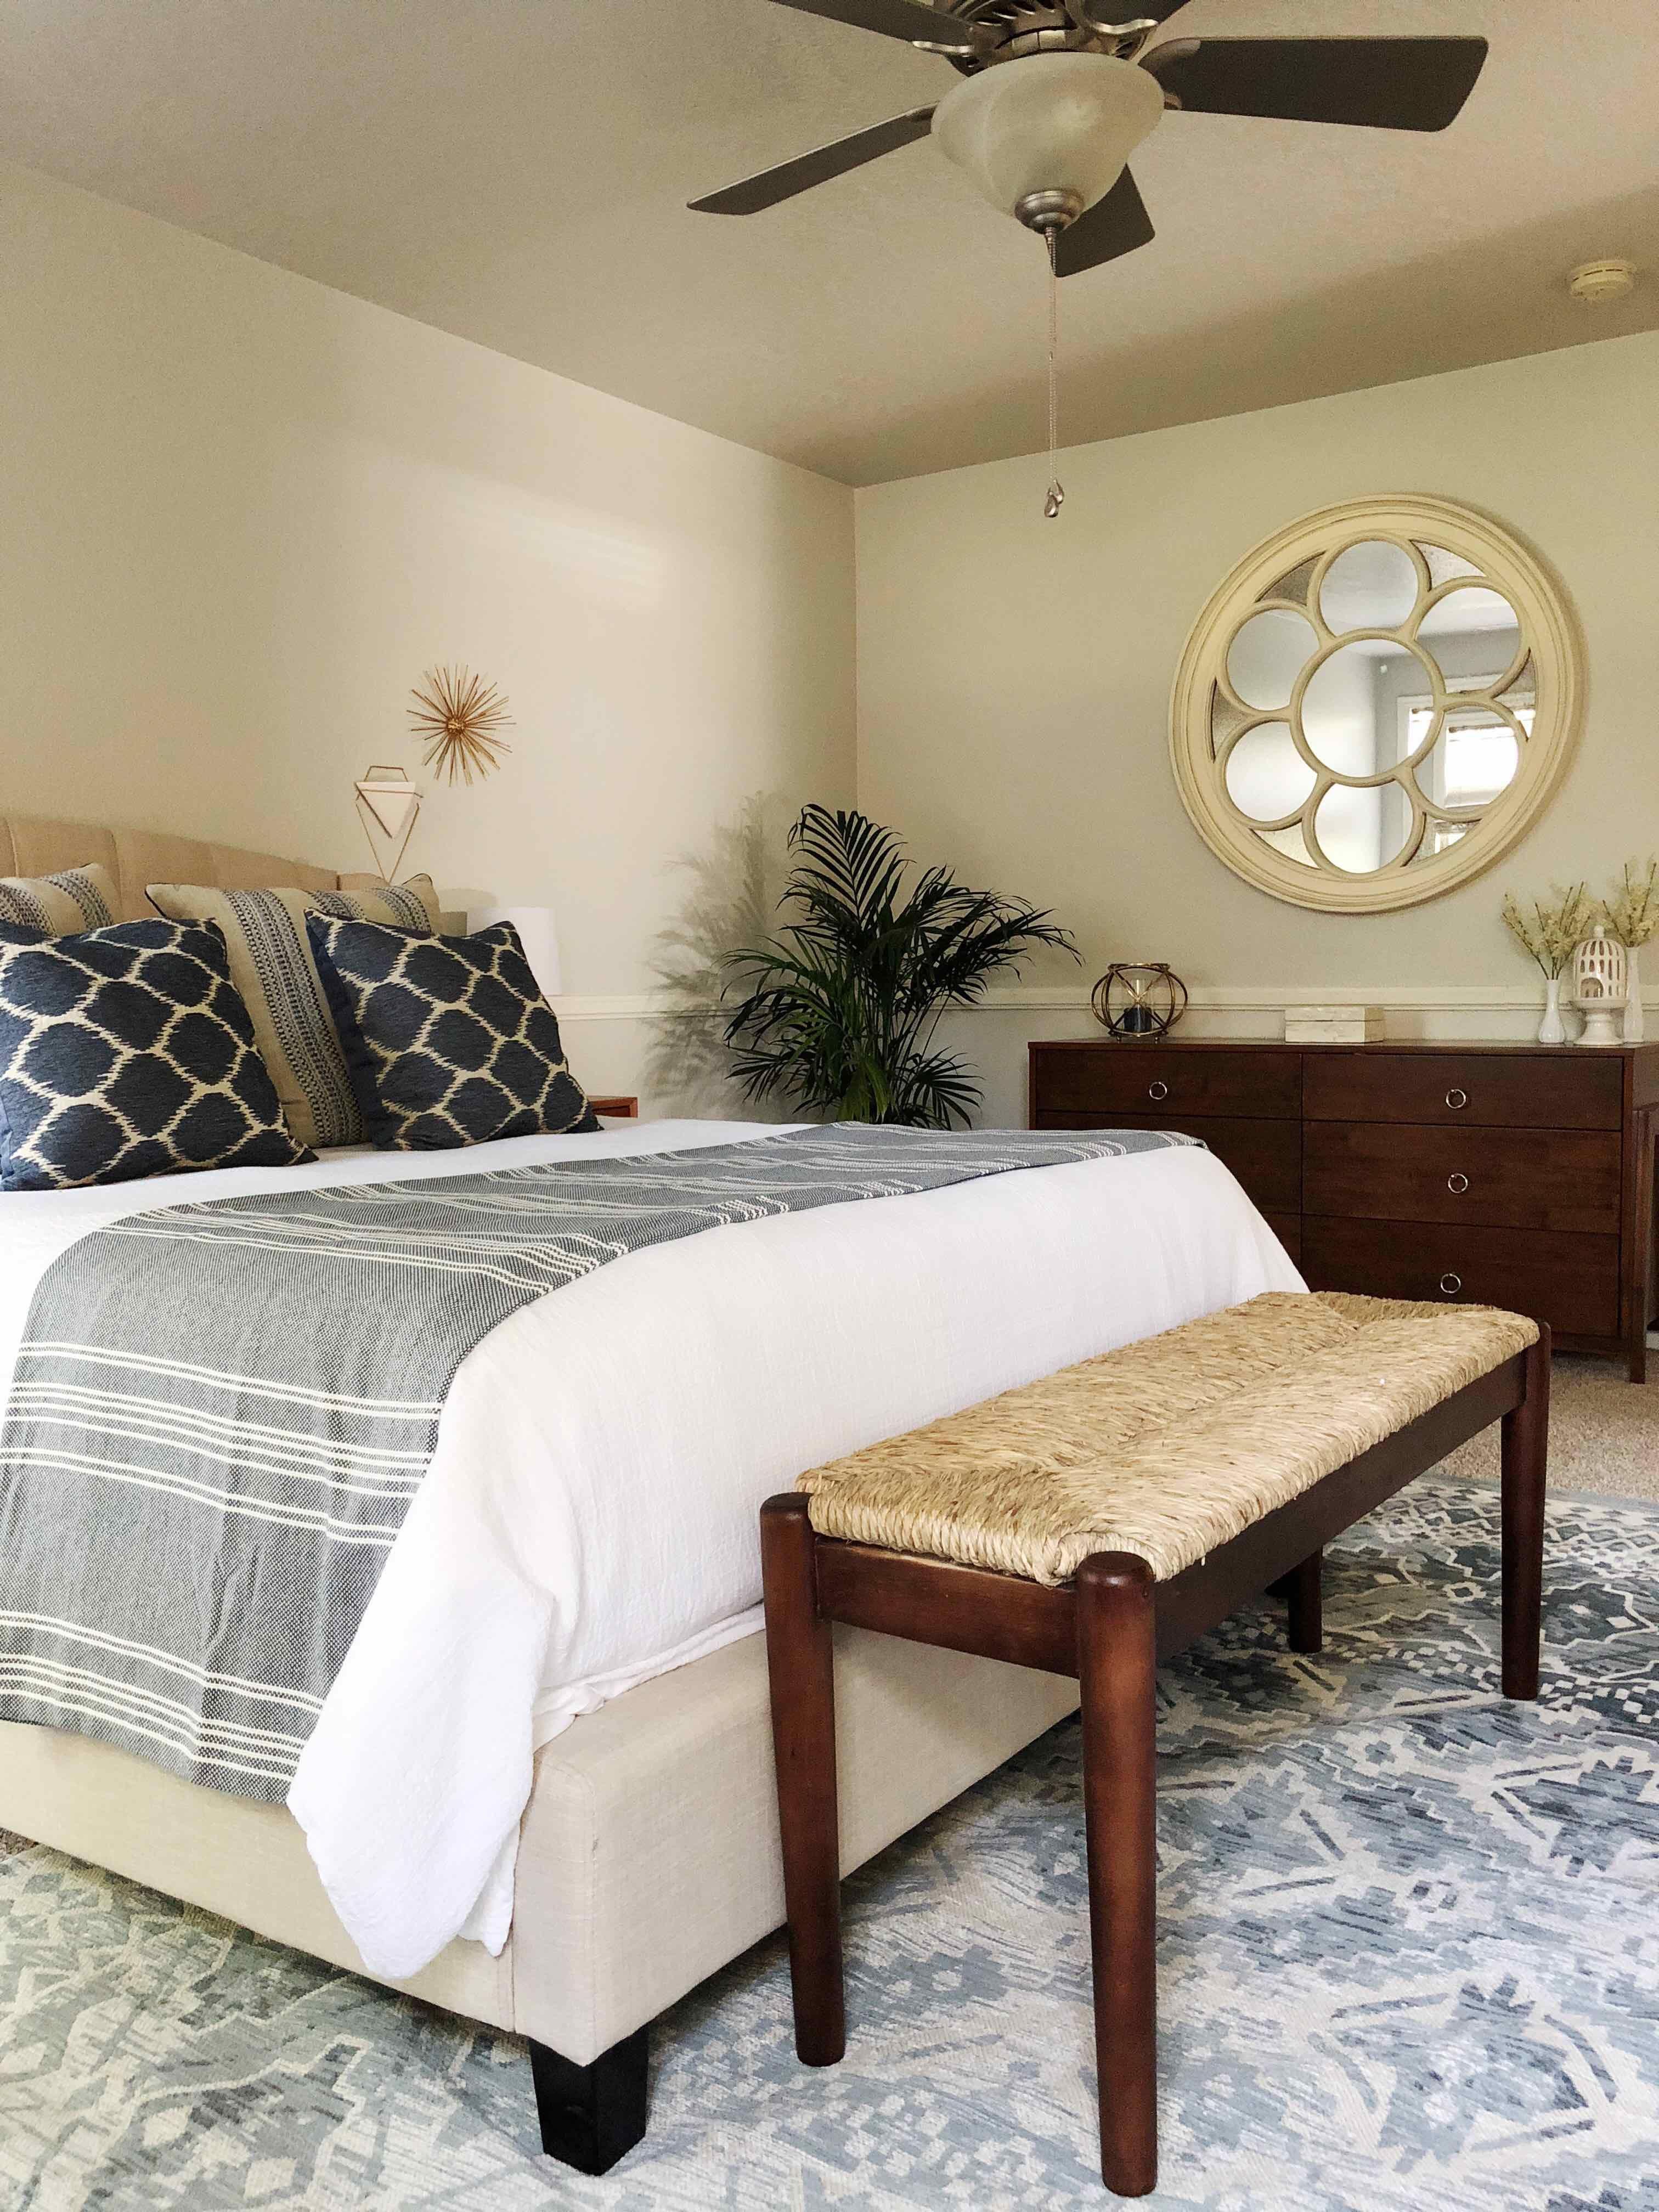 A Serene, Mid Century Modern, Coastal Style Master Bedroom